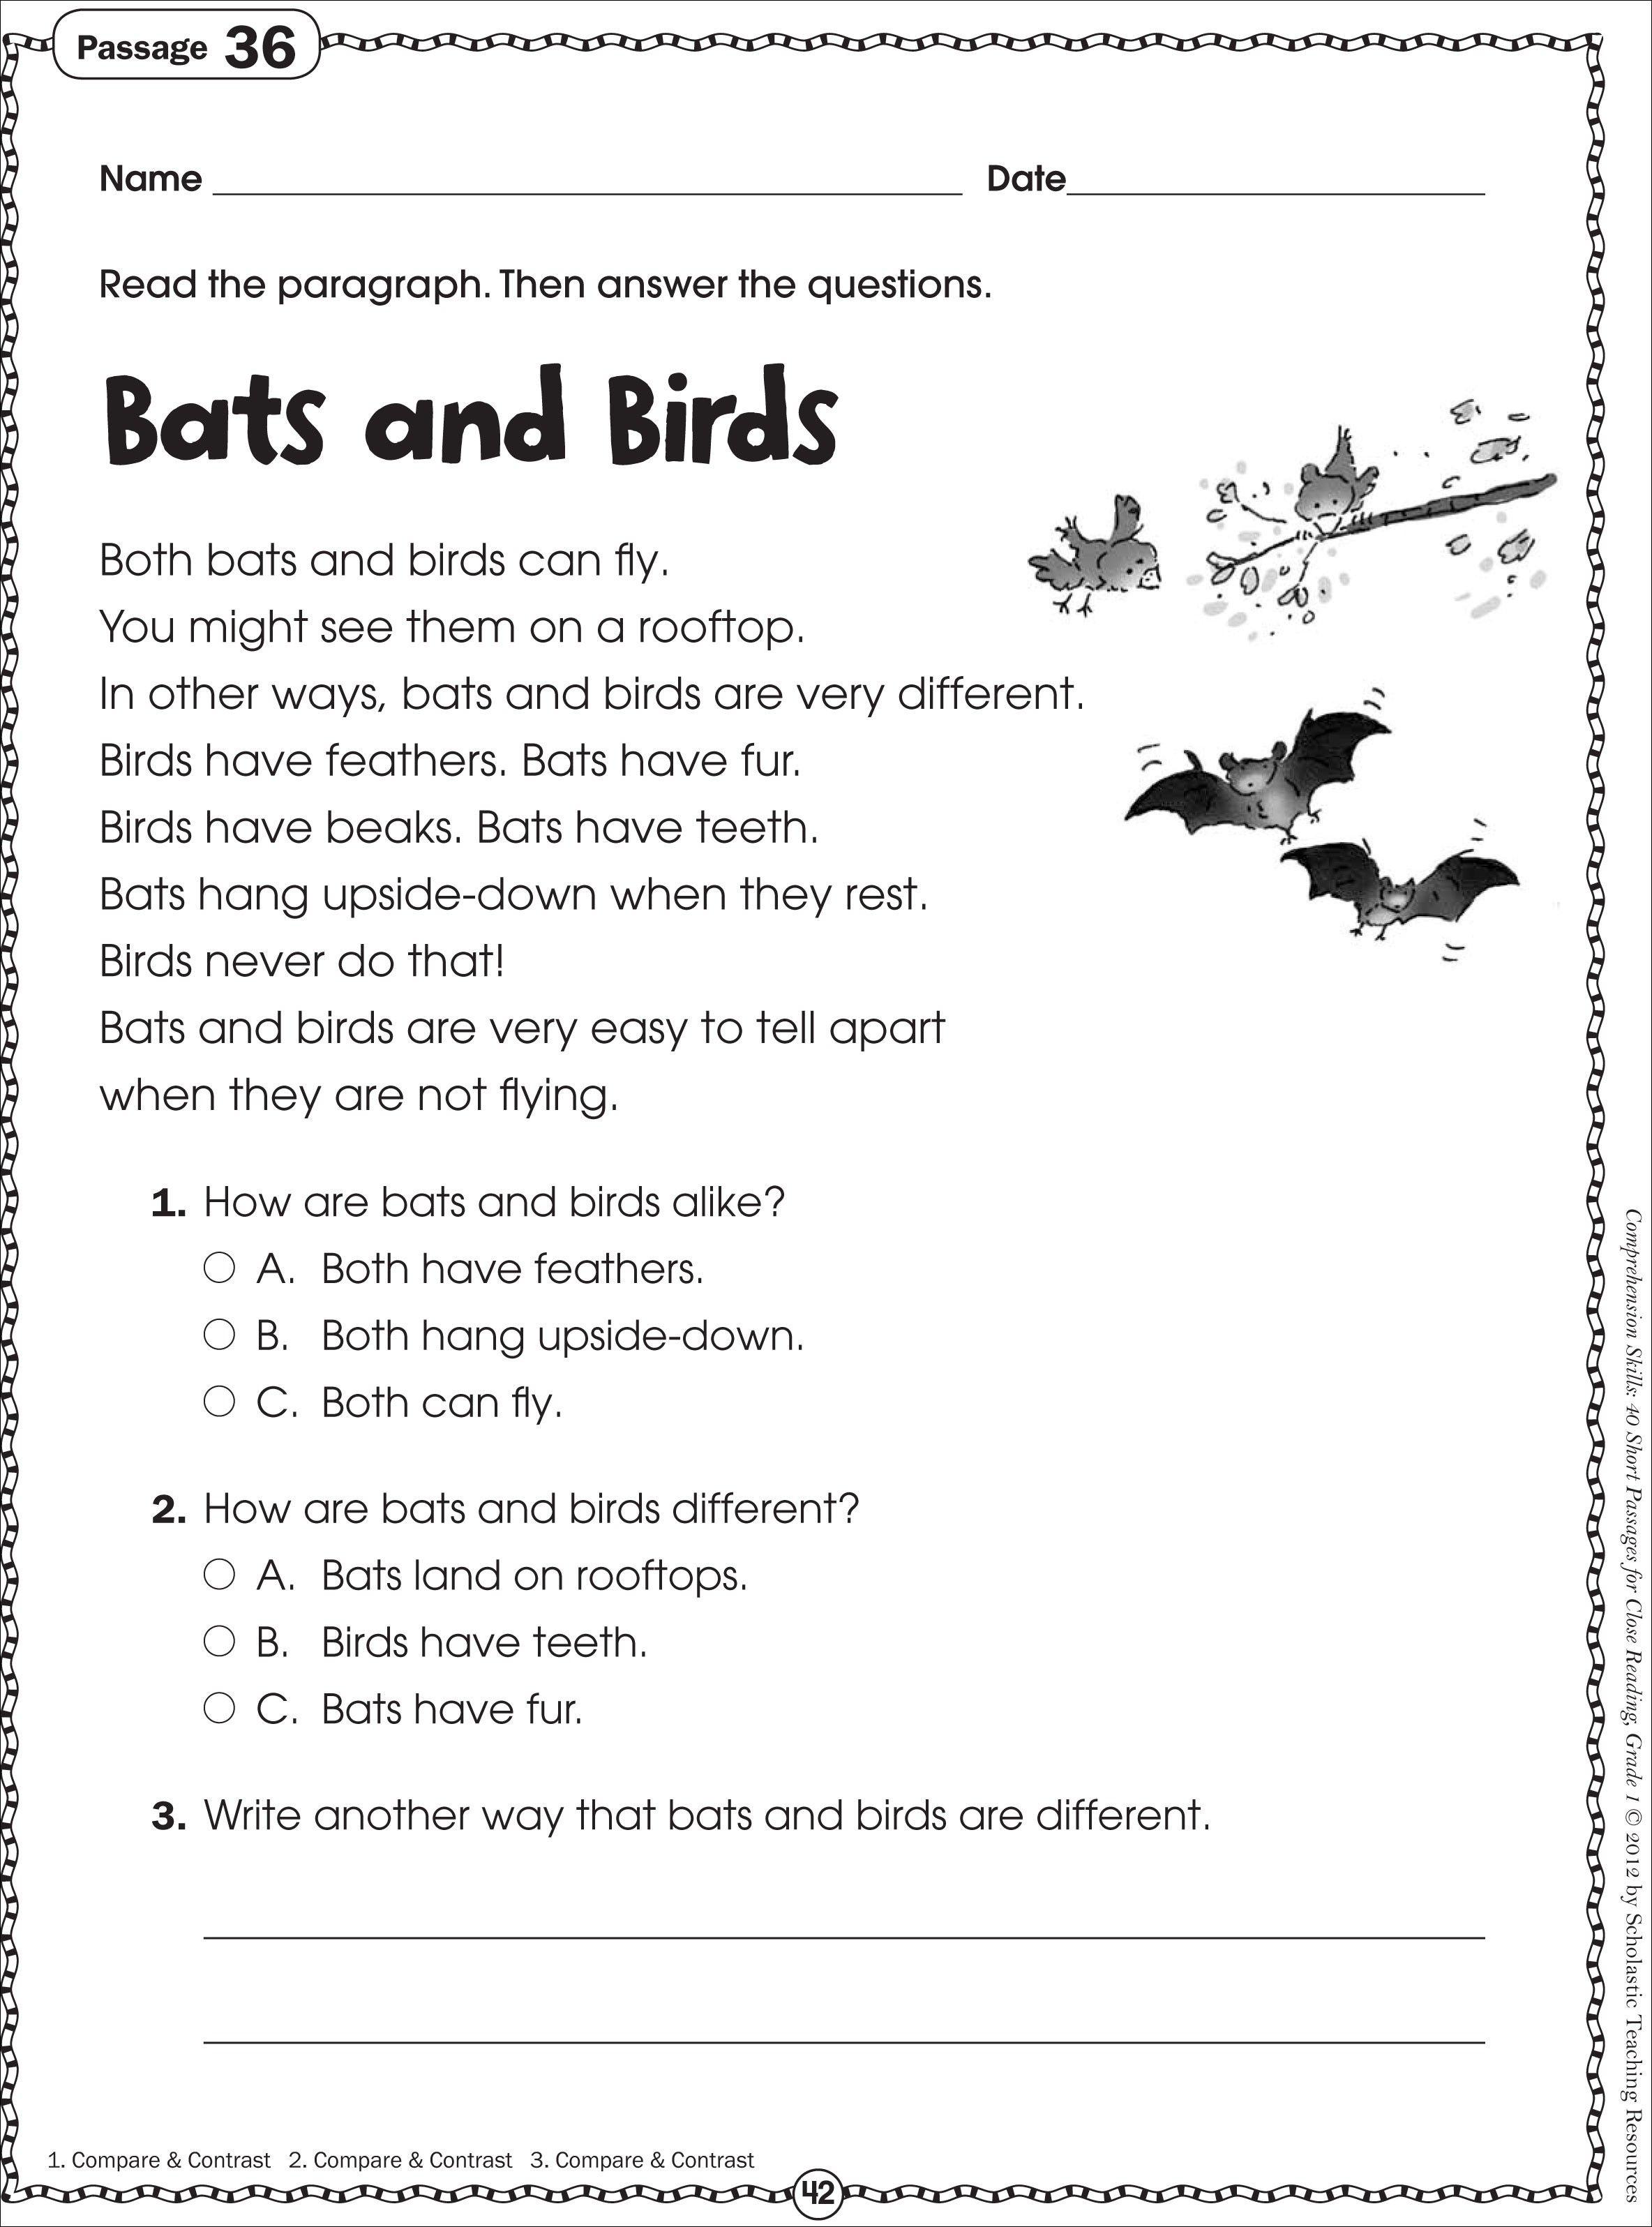 Free Printable Reading Comprehension Worksheets For Kindergarten - Free Printable Reading Worksheets